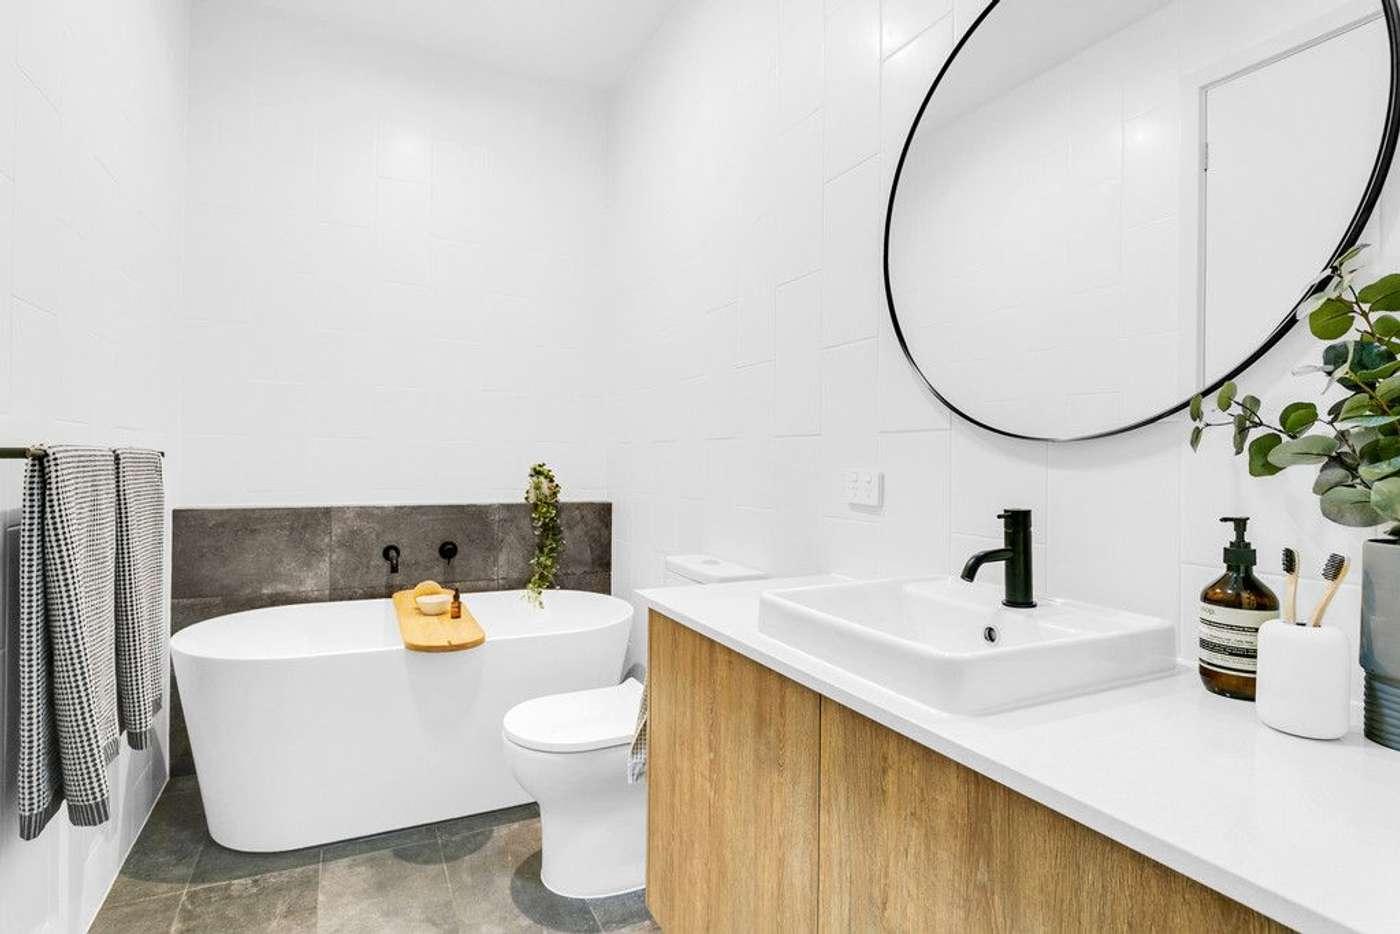 Seventh view of Homely house listing, 1B Helen Street, Glenelg North SA 5045